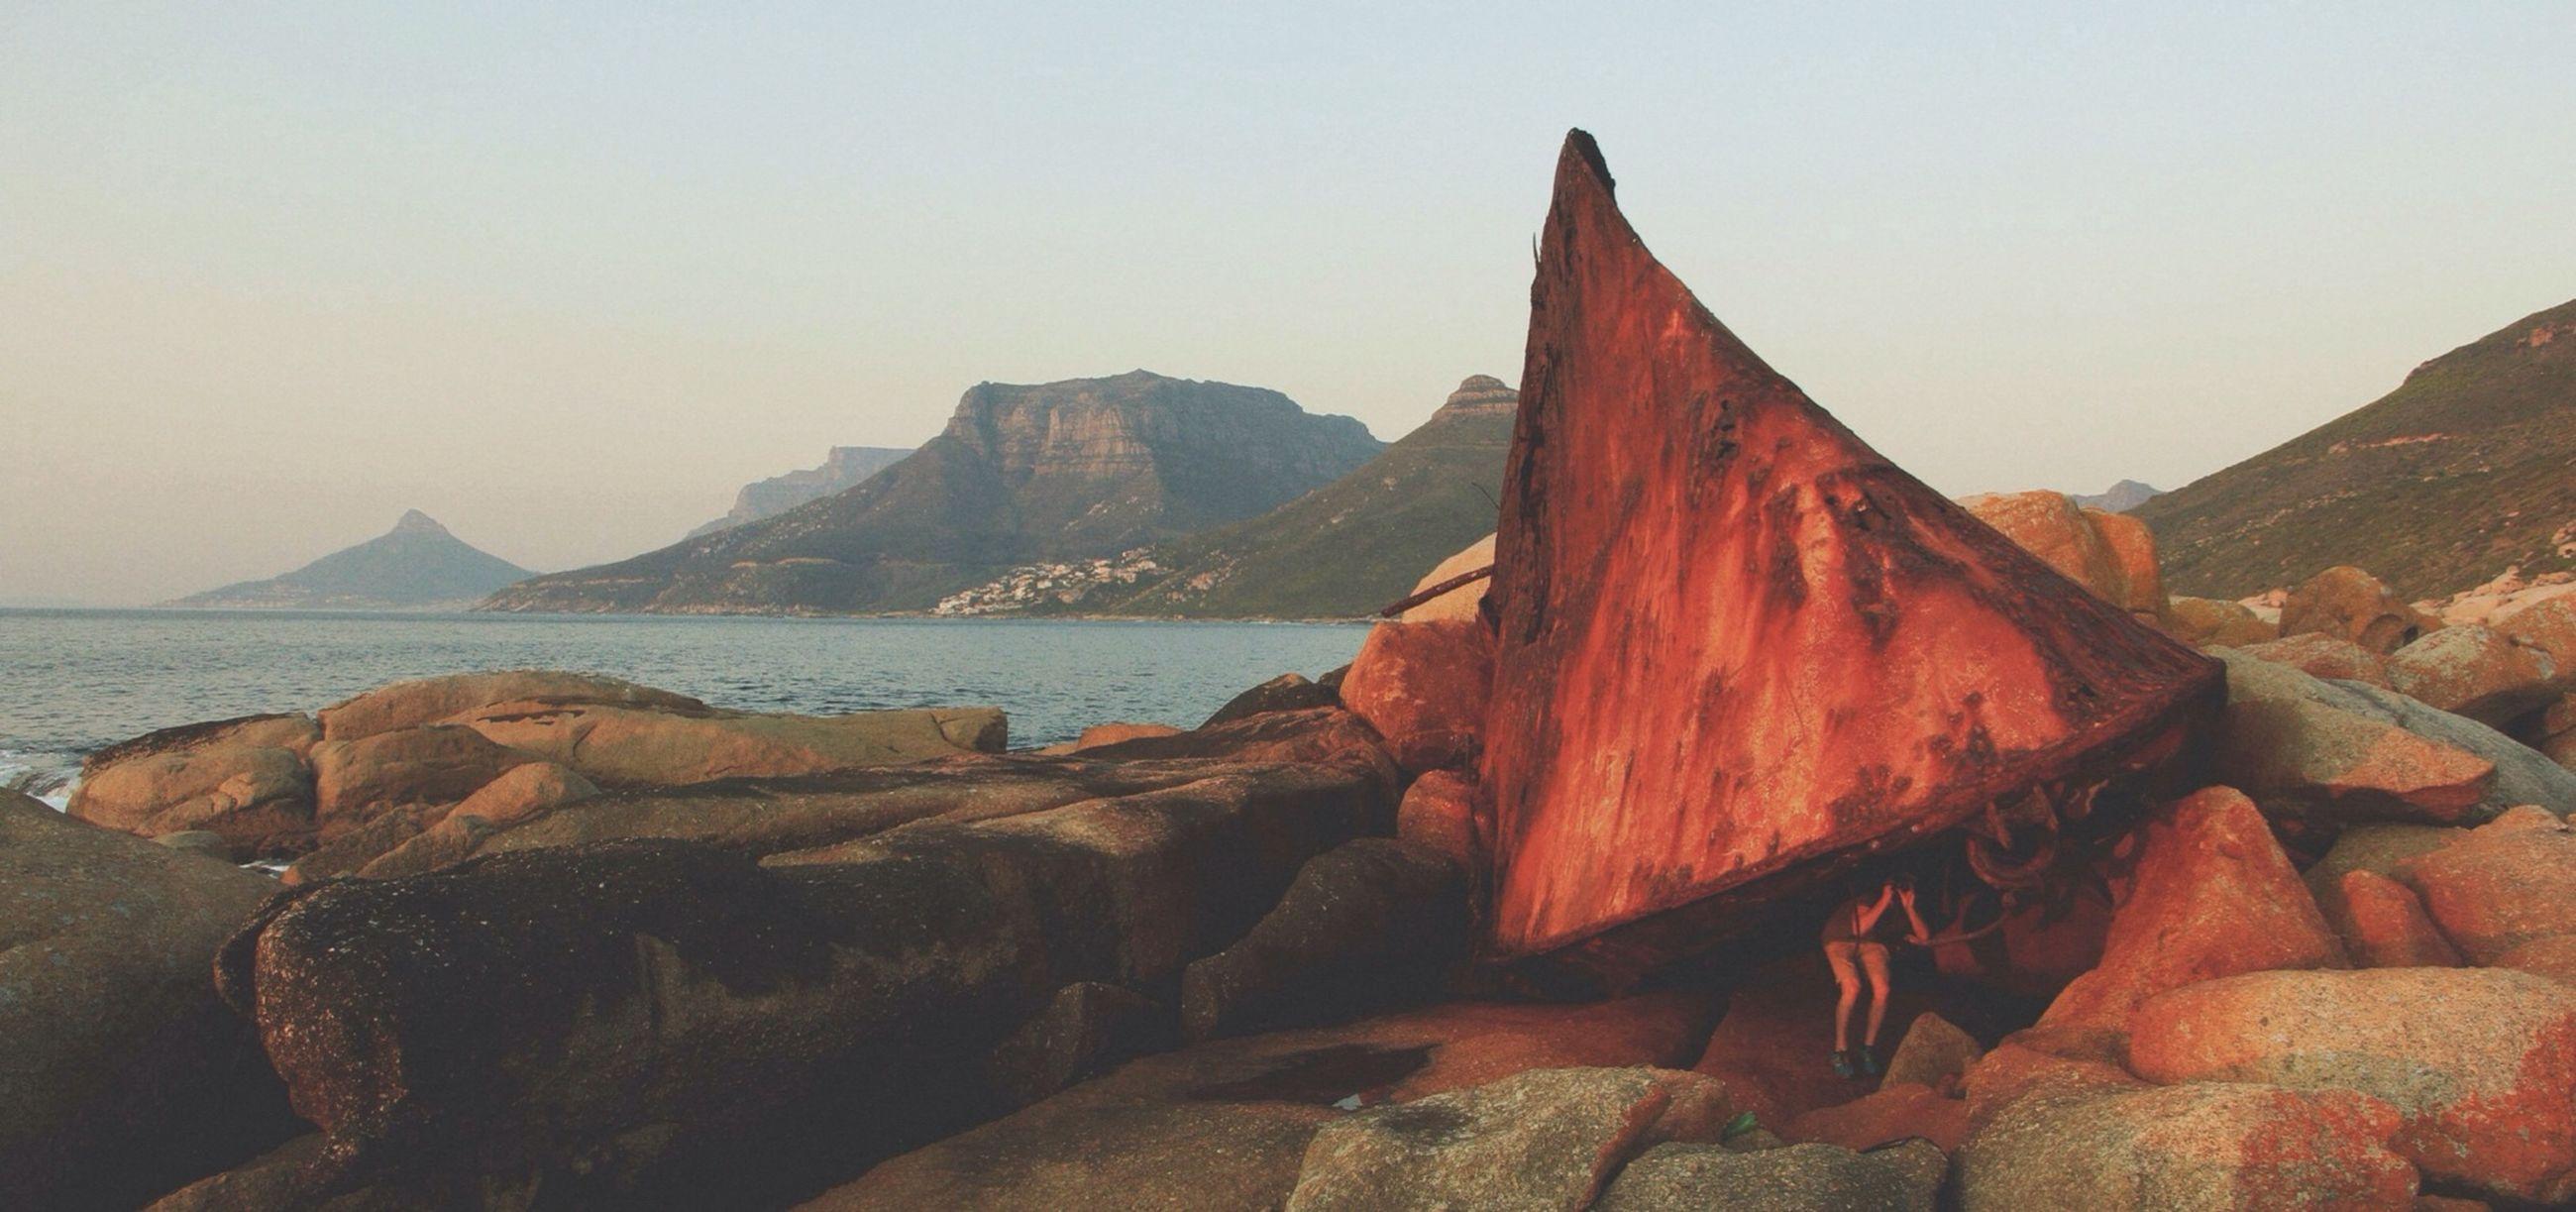 mountain, water, clear sky, tranquility, tranquil scene, scenics, sea, beauty in nature, rock - object, nature, rock formation, copy space, sky, mountain range, transportation, idyllic, beach, non-urban scene, outdoors, sunlight